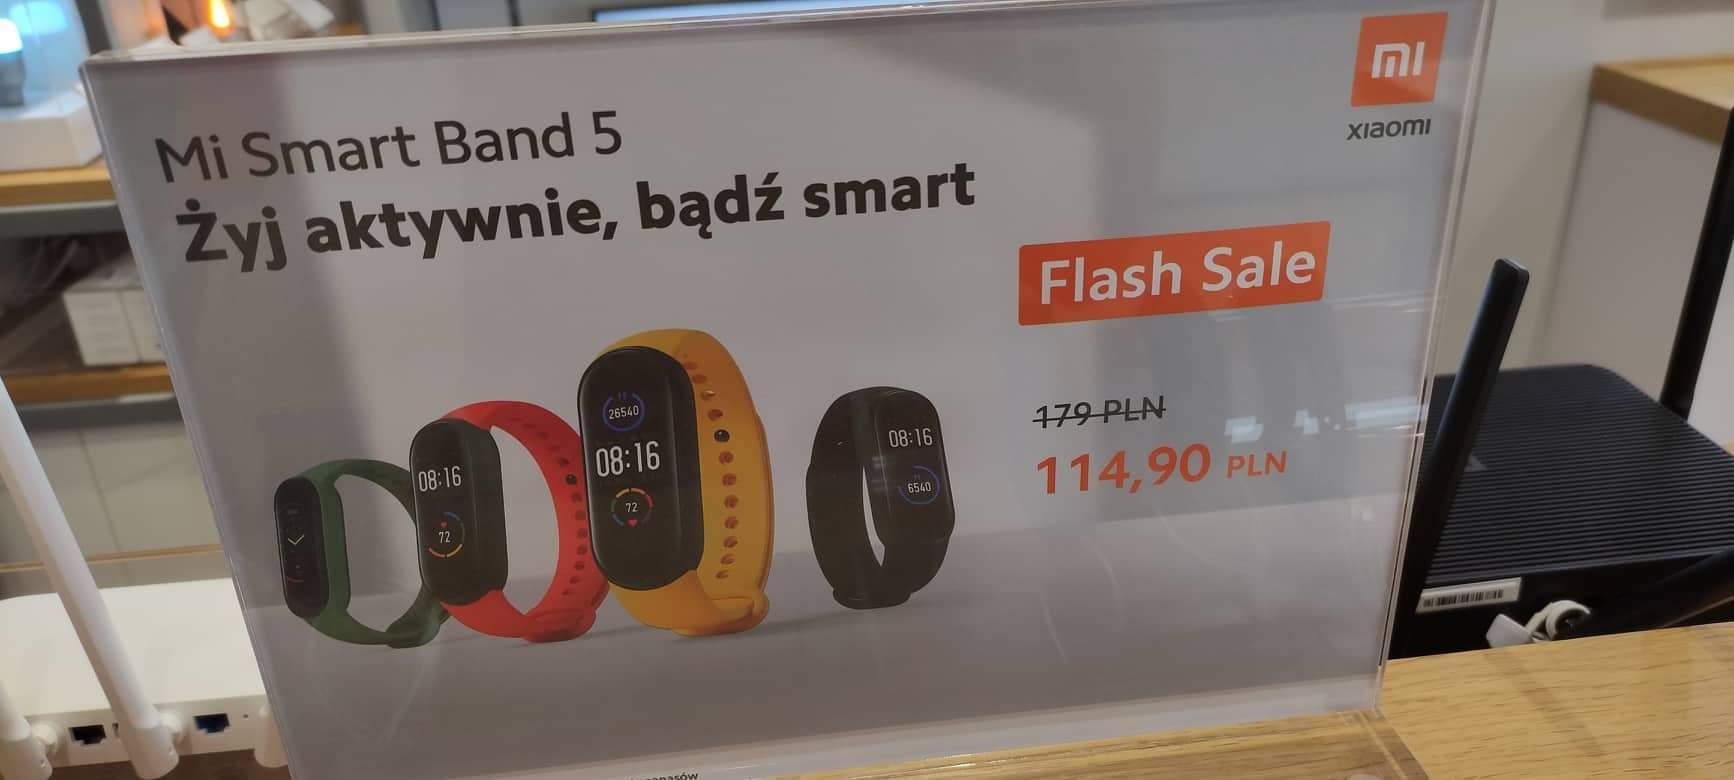 Smartband Xiaomi Mi Band 5 Mi Store Katowice